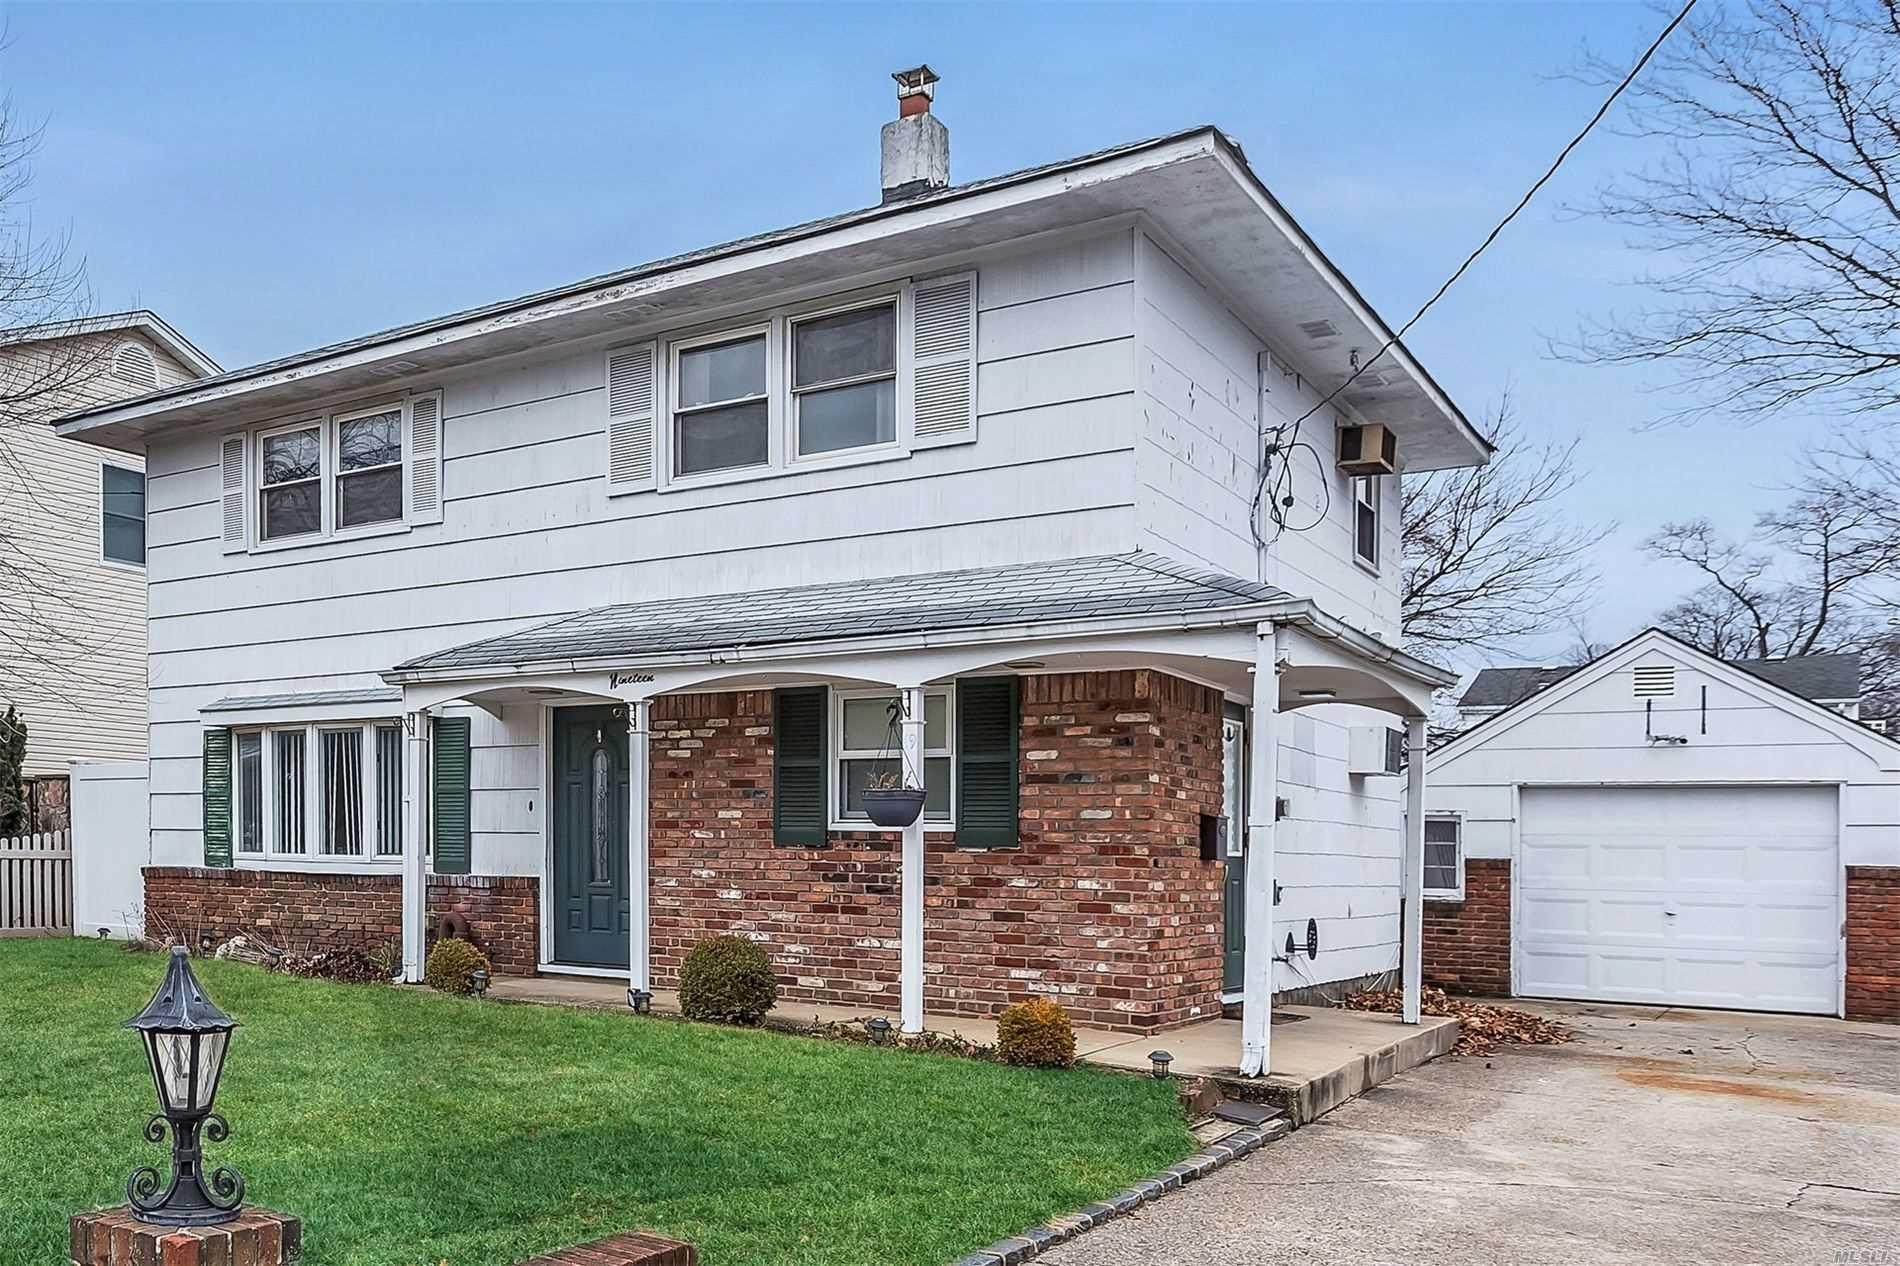 19 Keeler Avenue, Merrick, NY 11566 - MLS#: 3186713